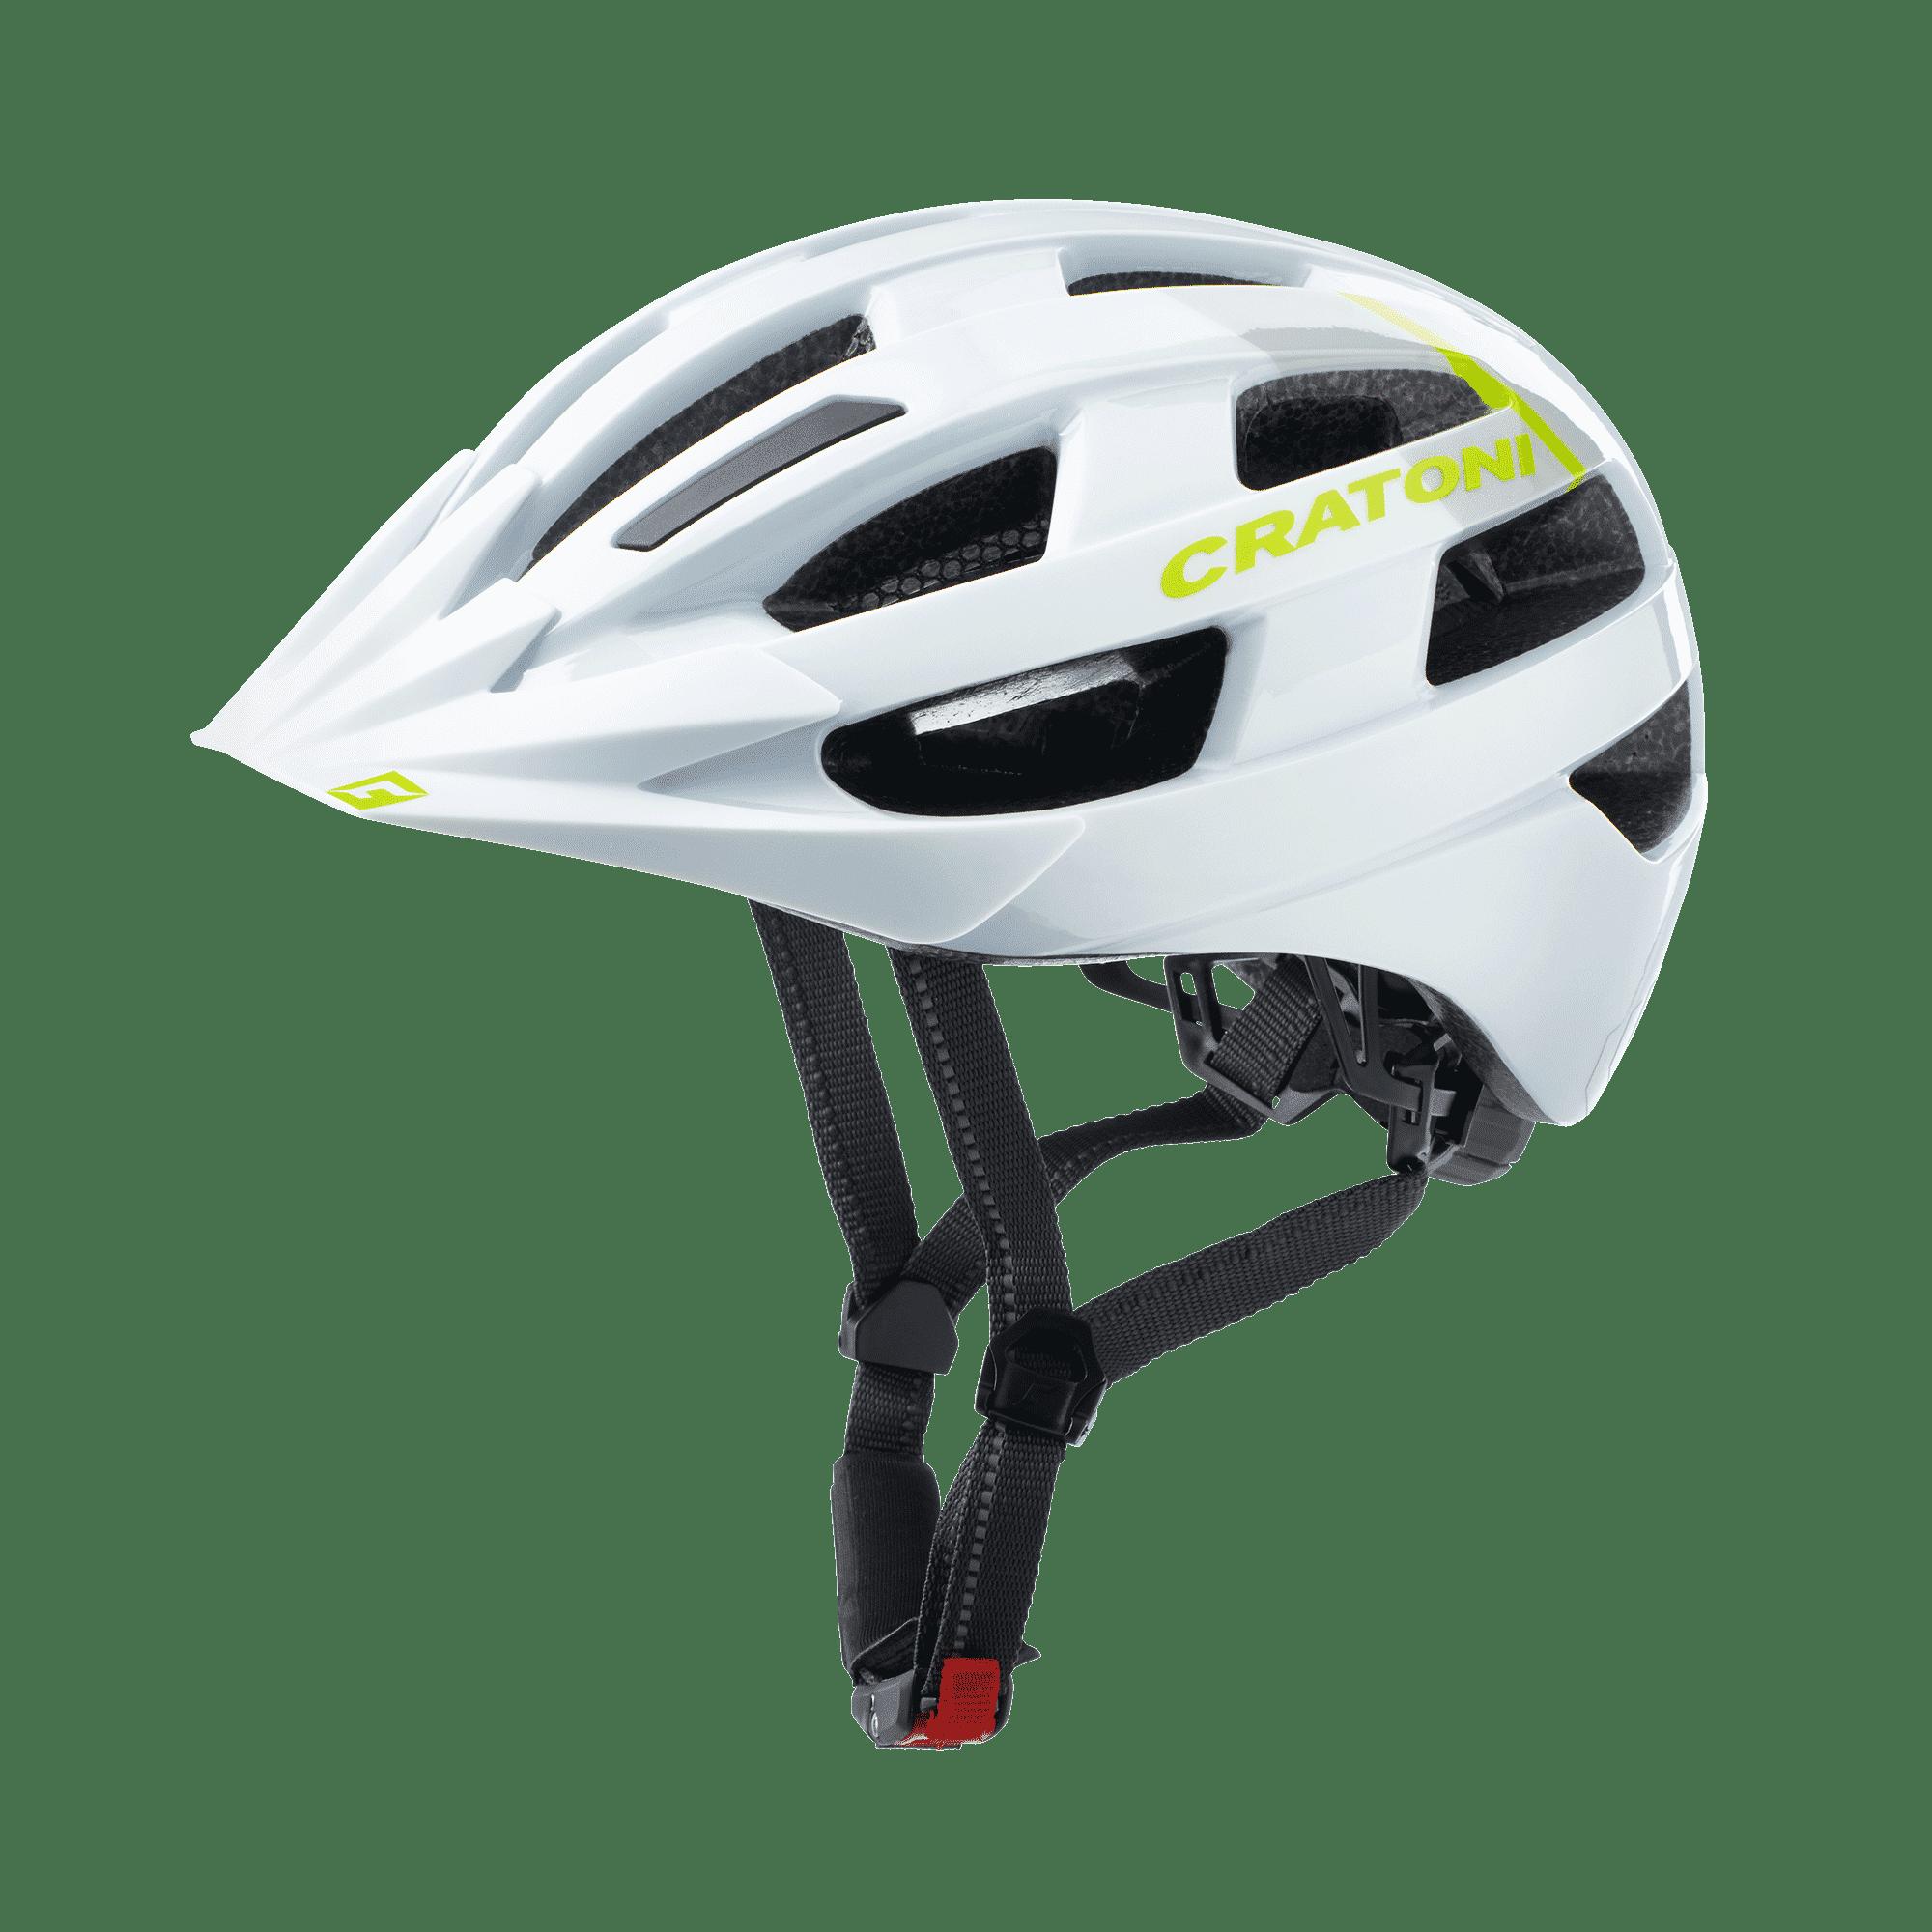 Velo-X white lime glossy